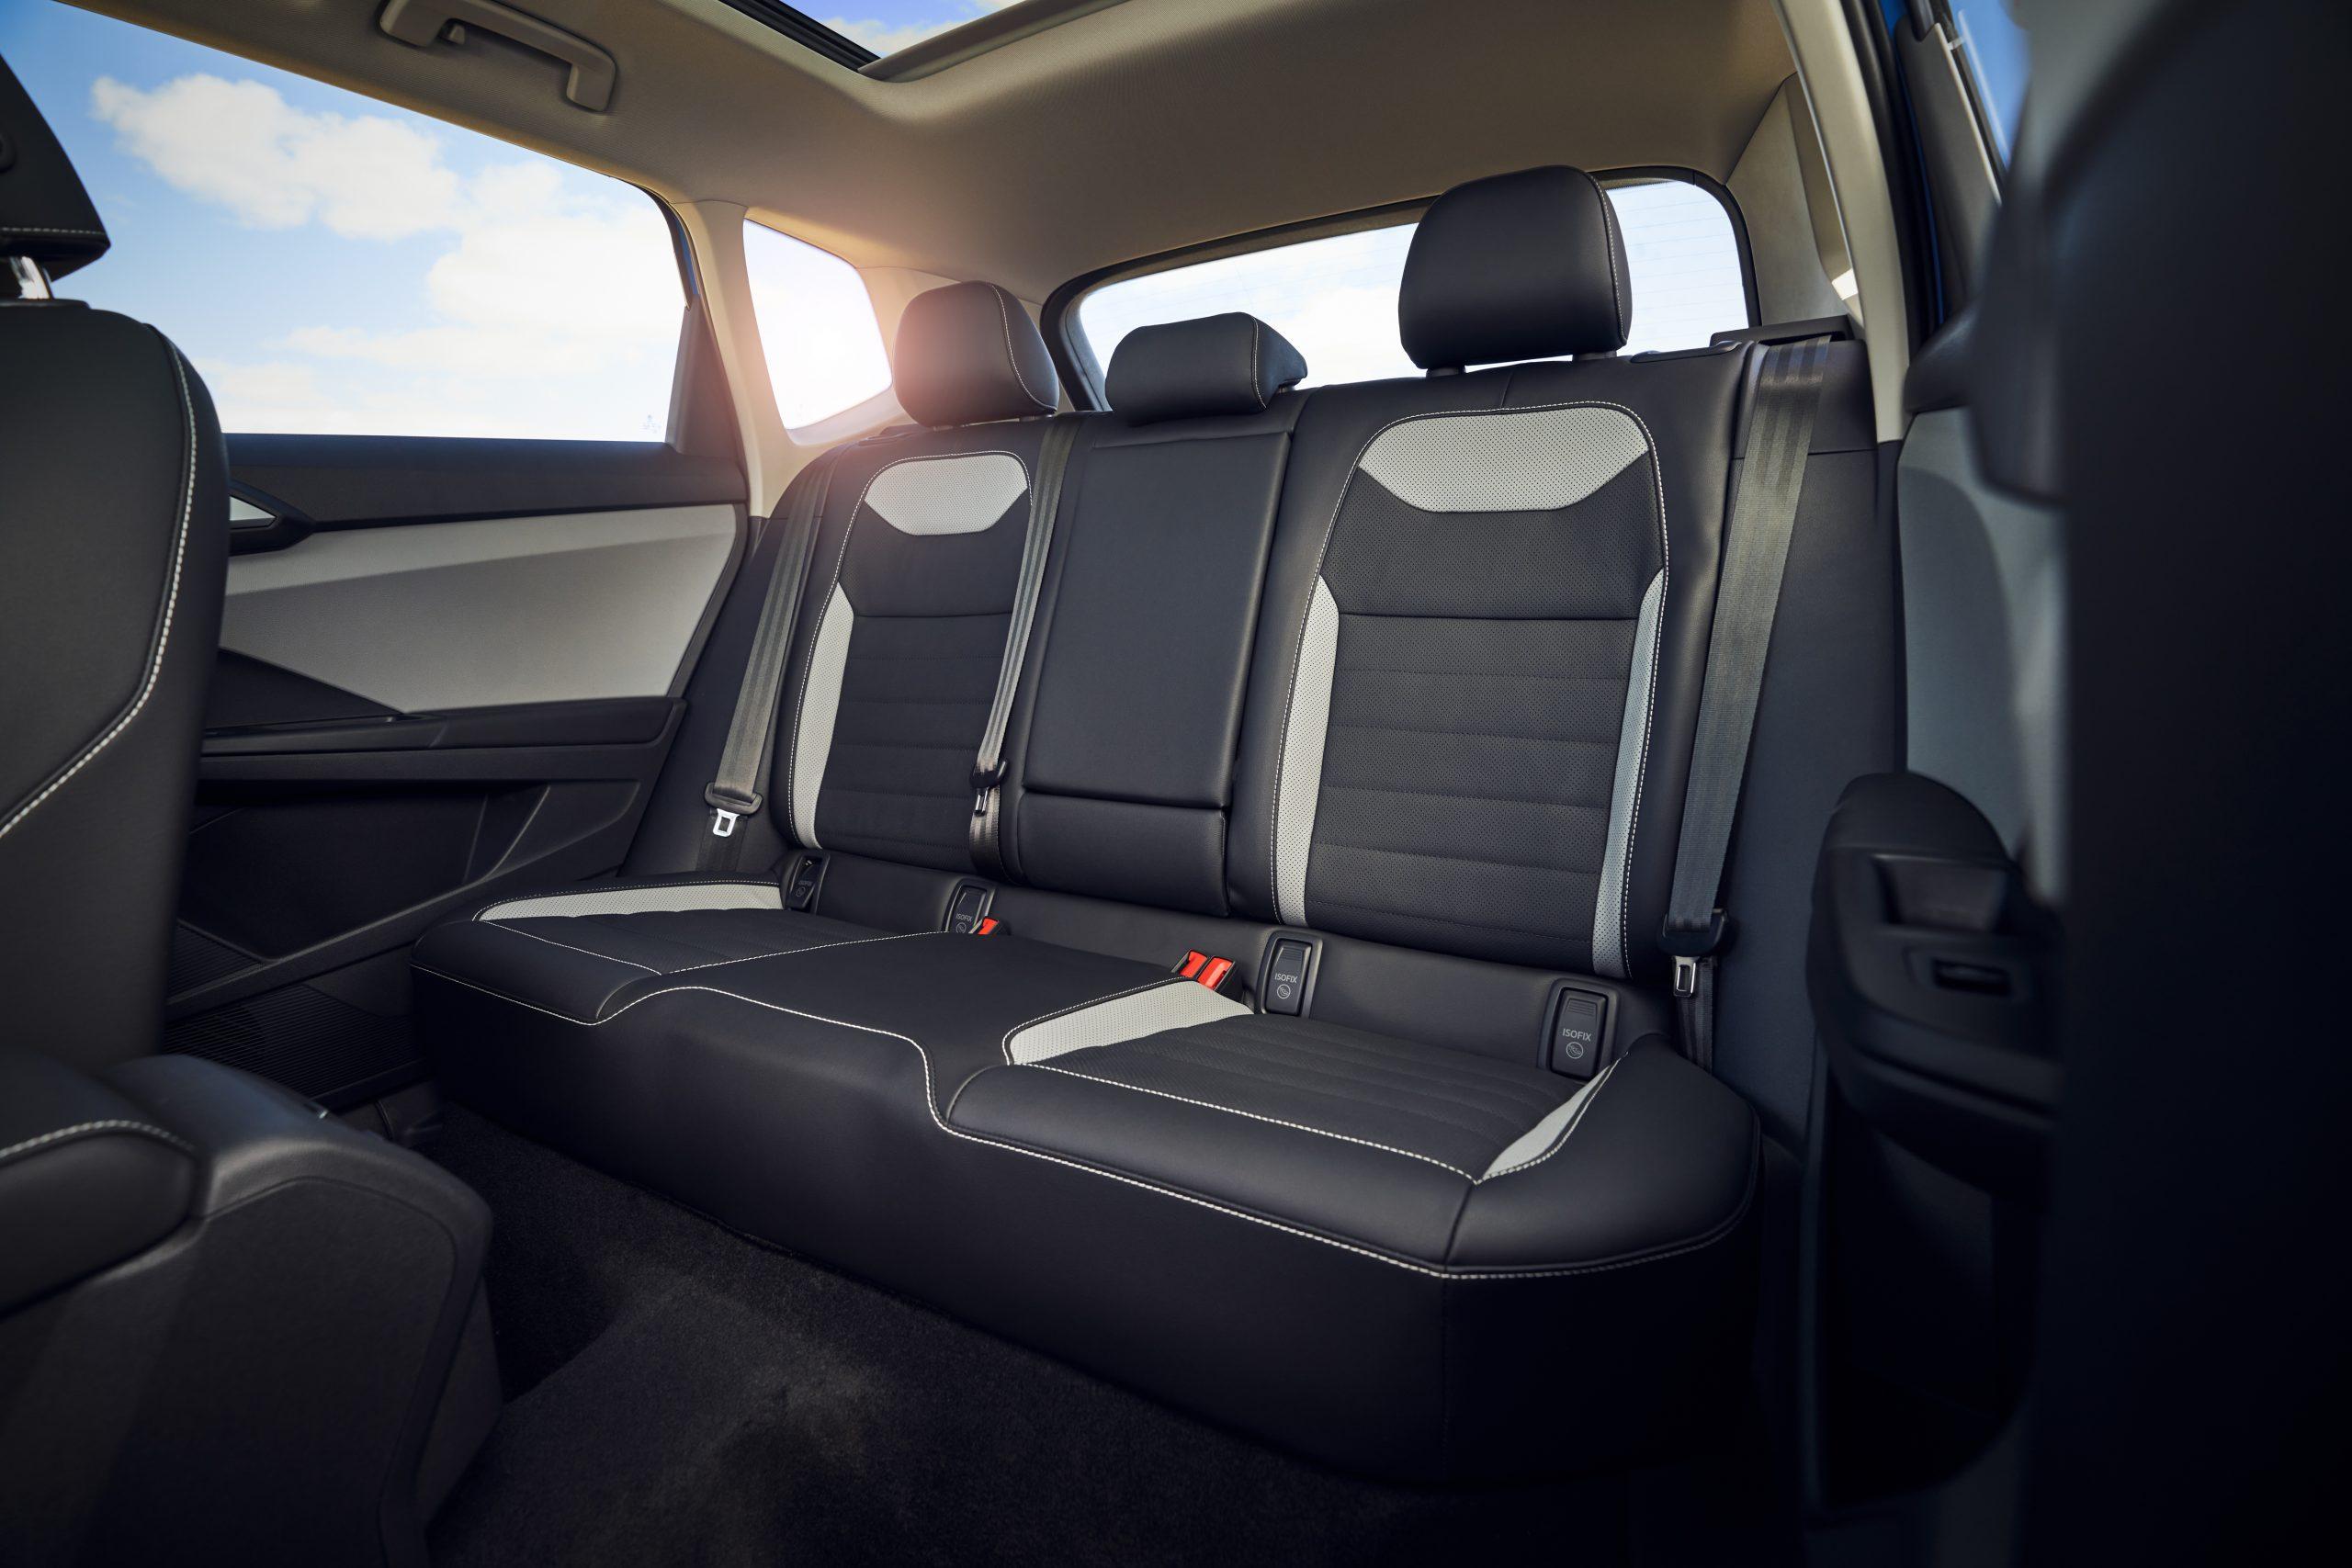 2022 Volkswagen Taos back seat